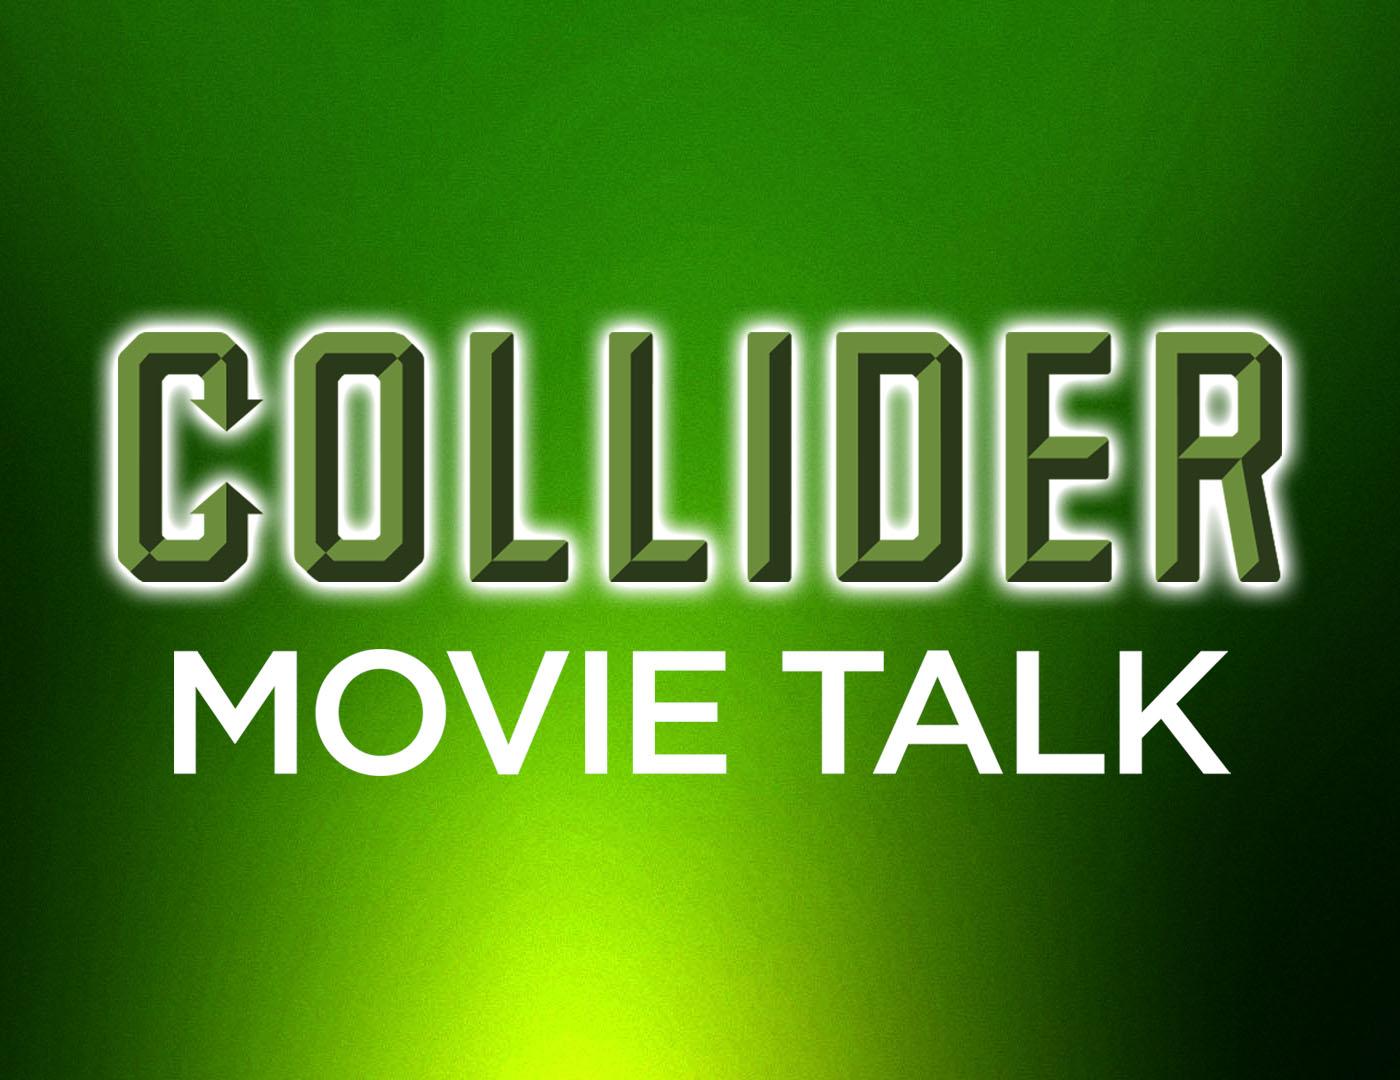 Collider Movie Talk - Batman V Superman Image Suggests Darkseid